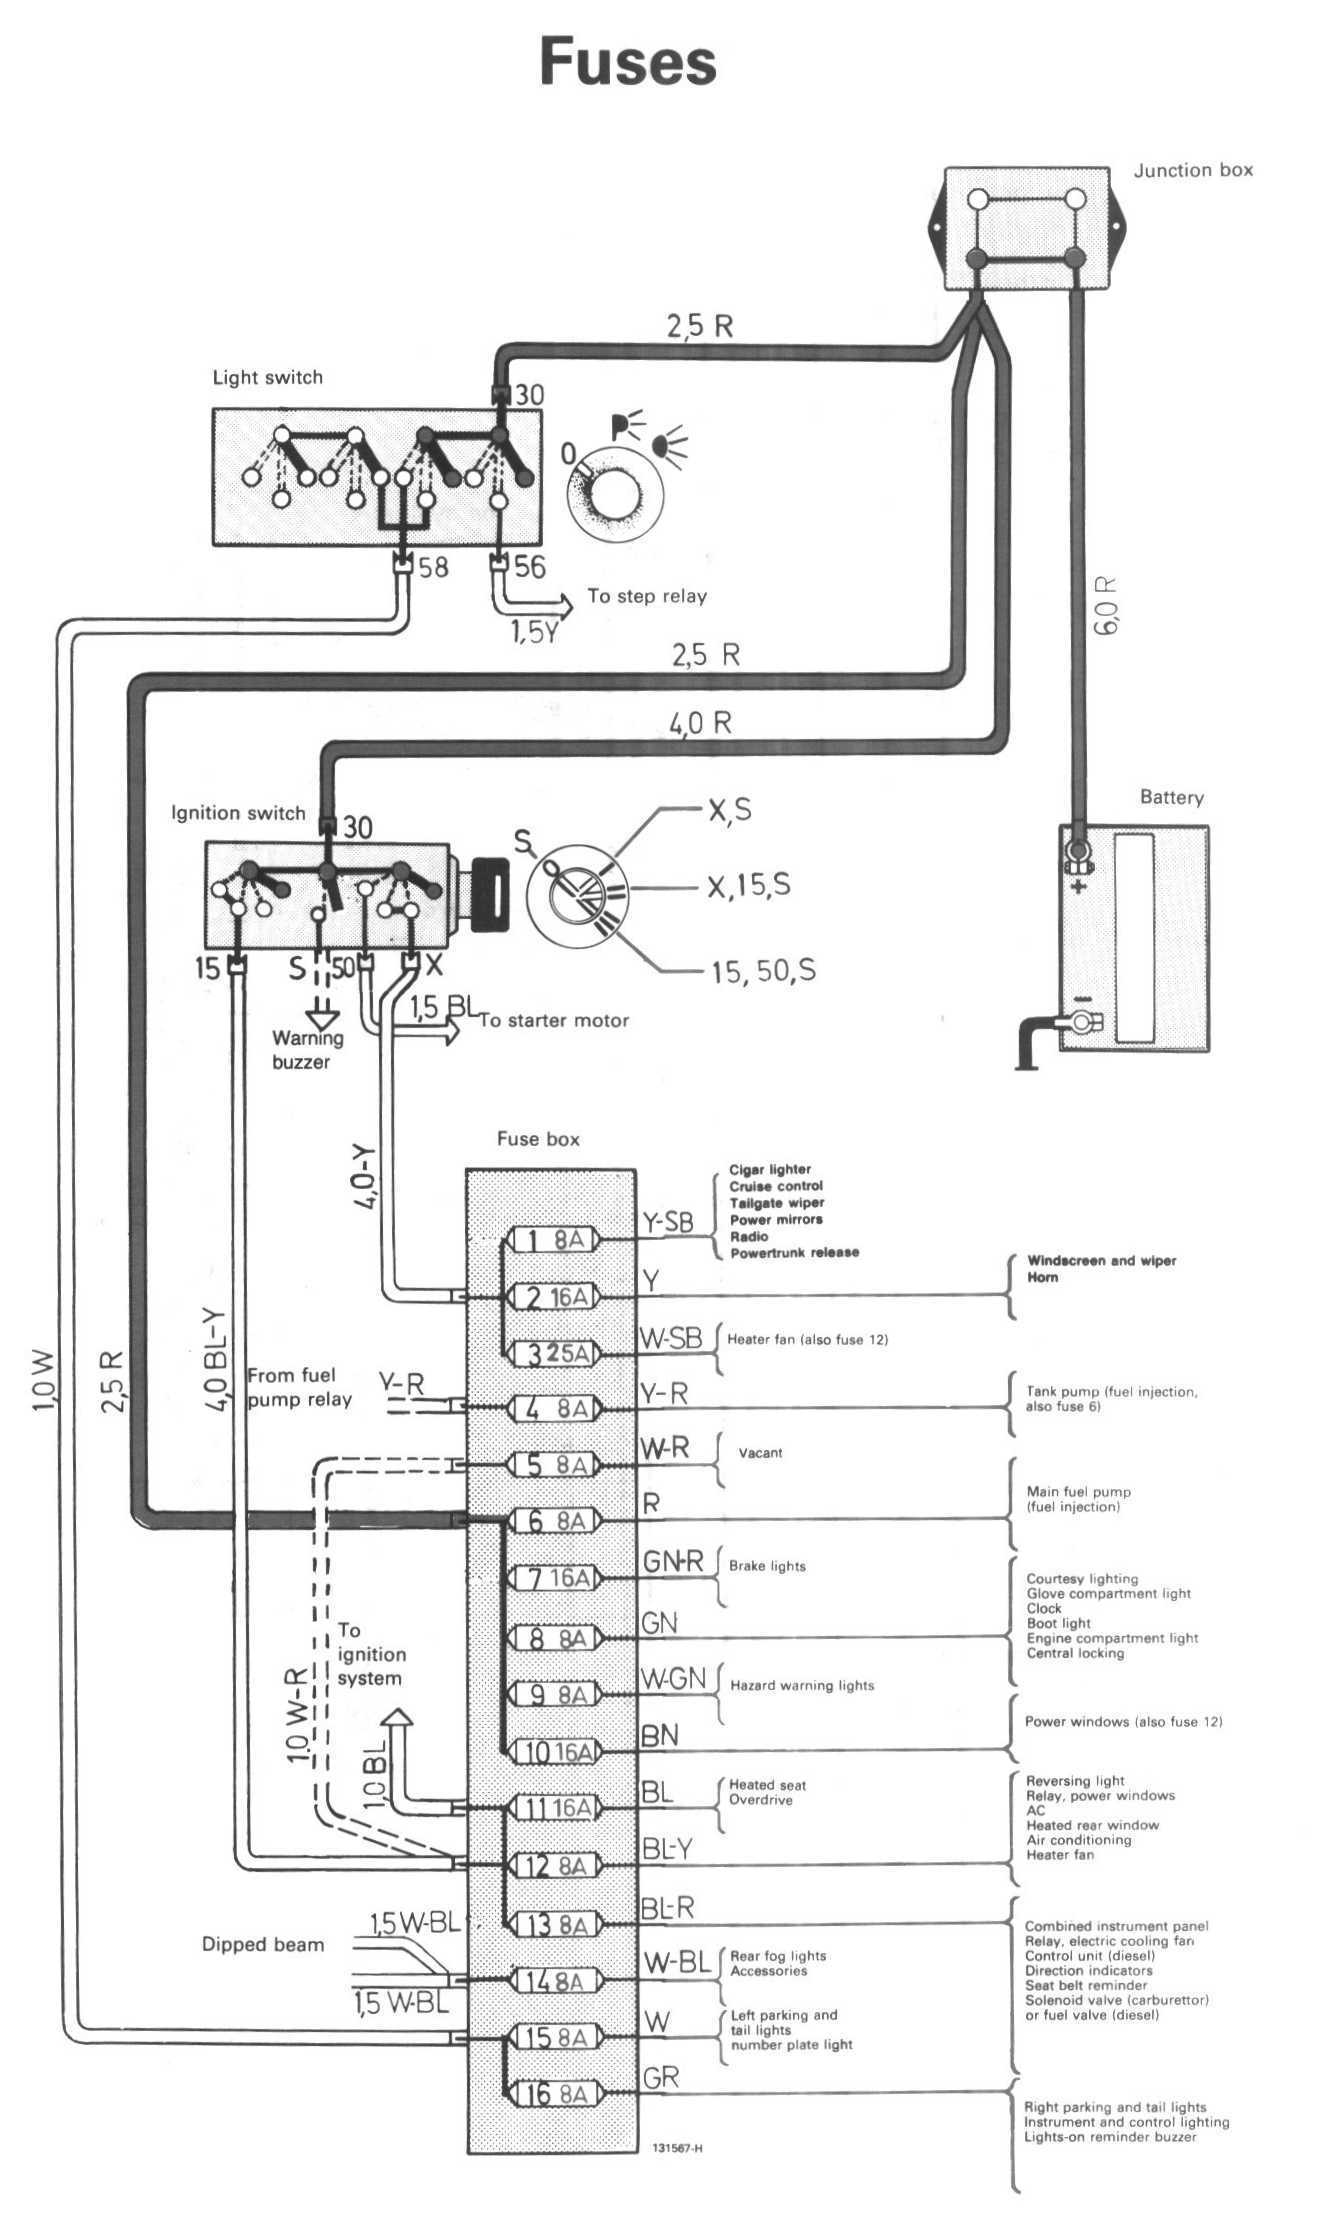 lg_8985] 1992 volvo 240 wiring schematic wiring diagram volvo 91 240 wiring diagrams